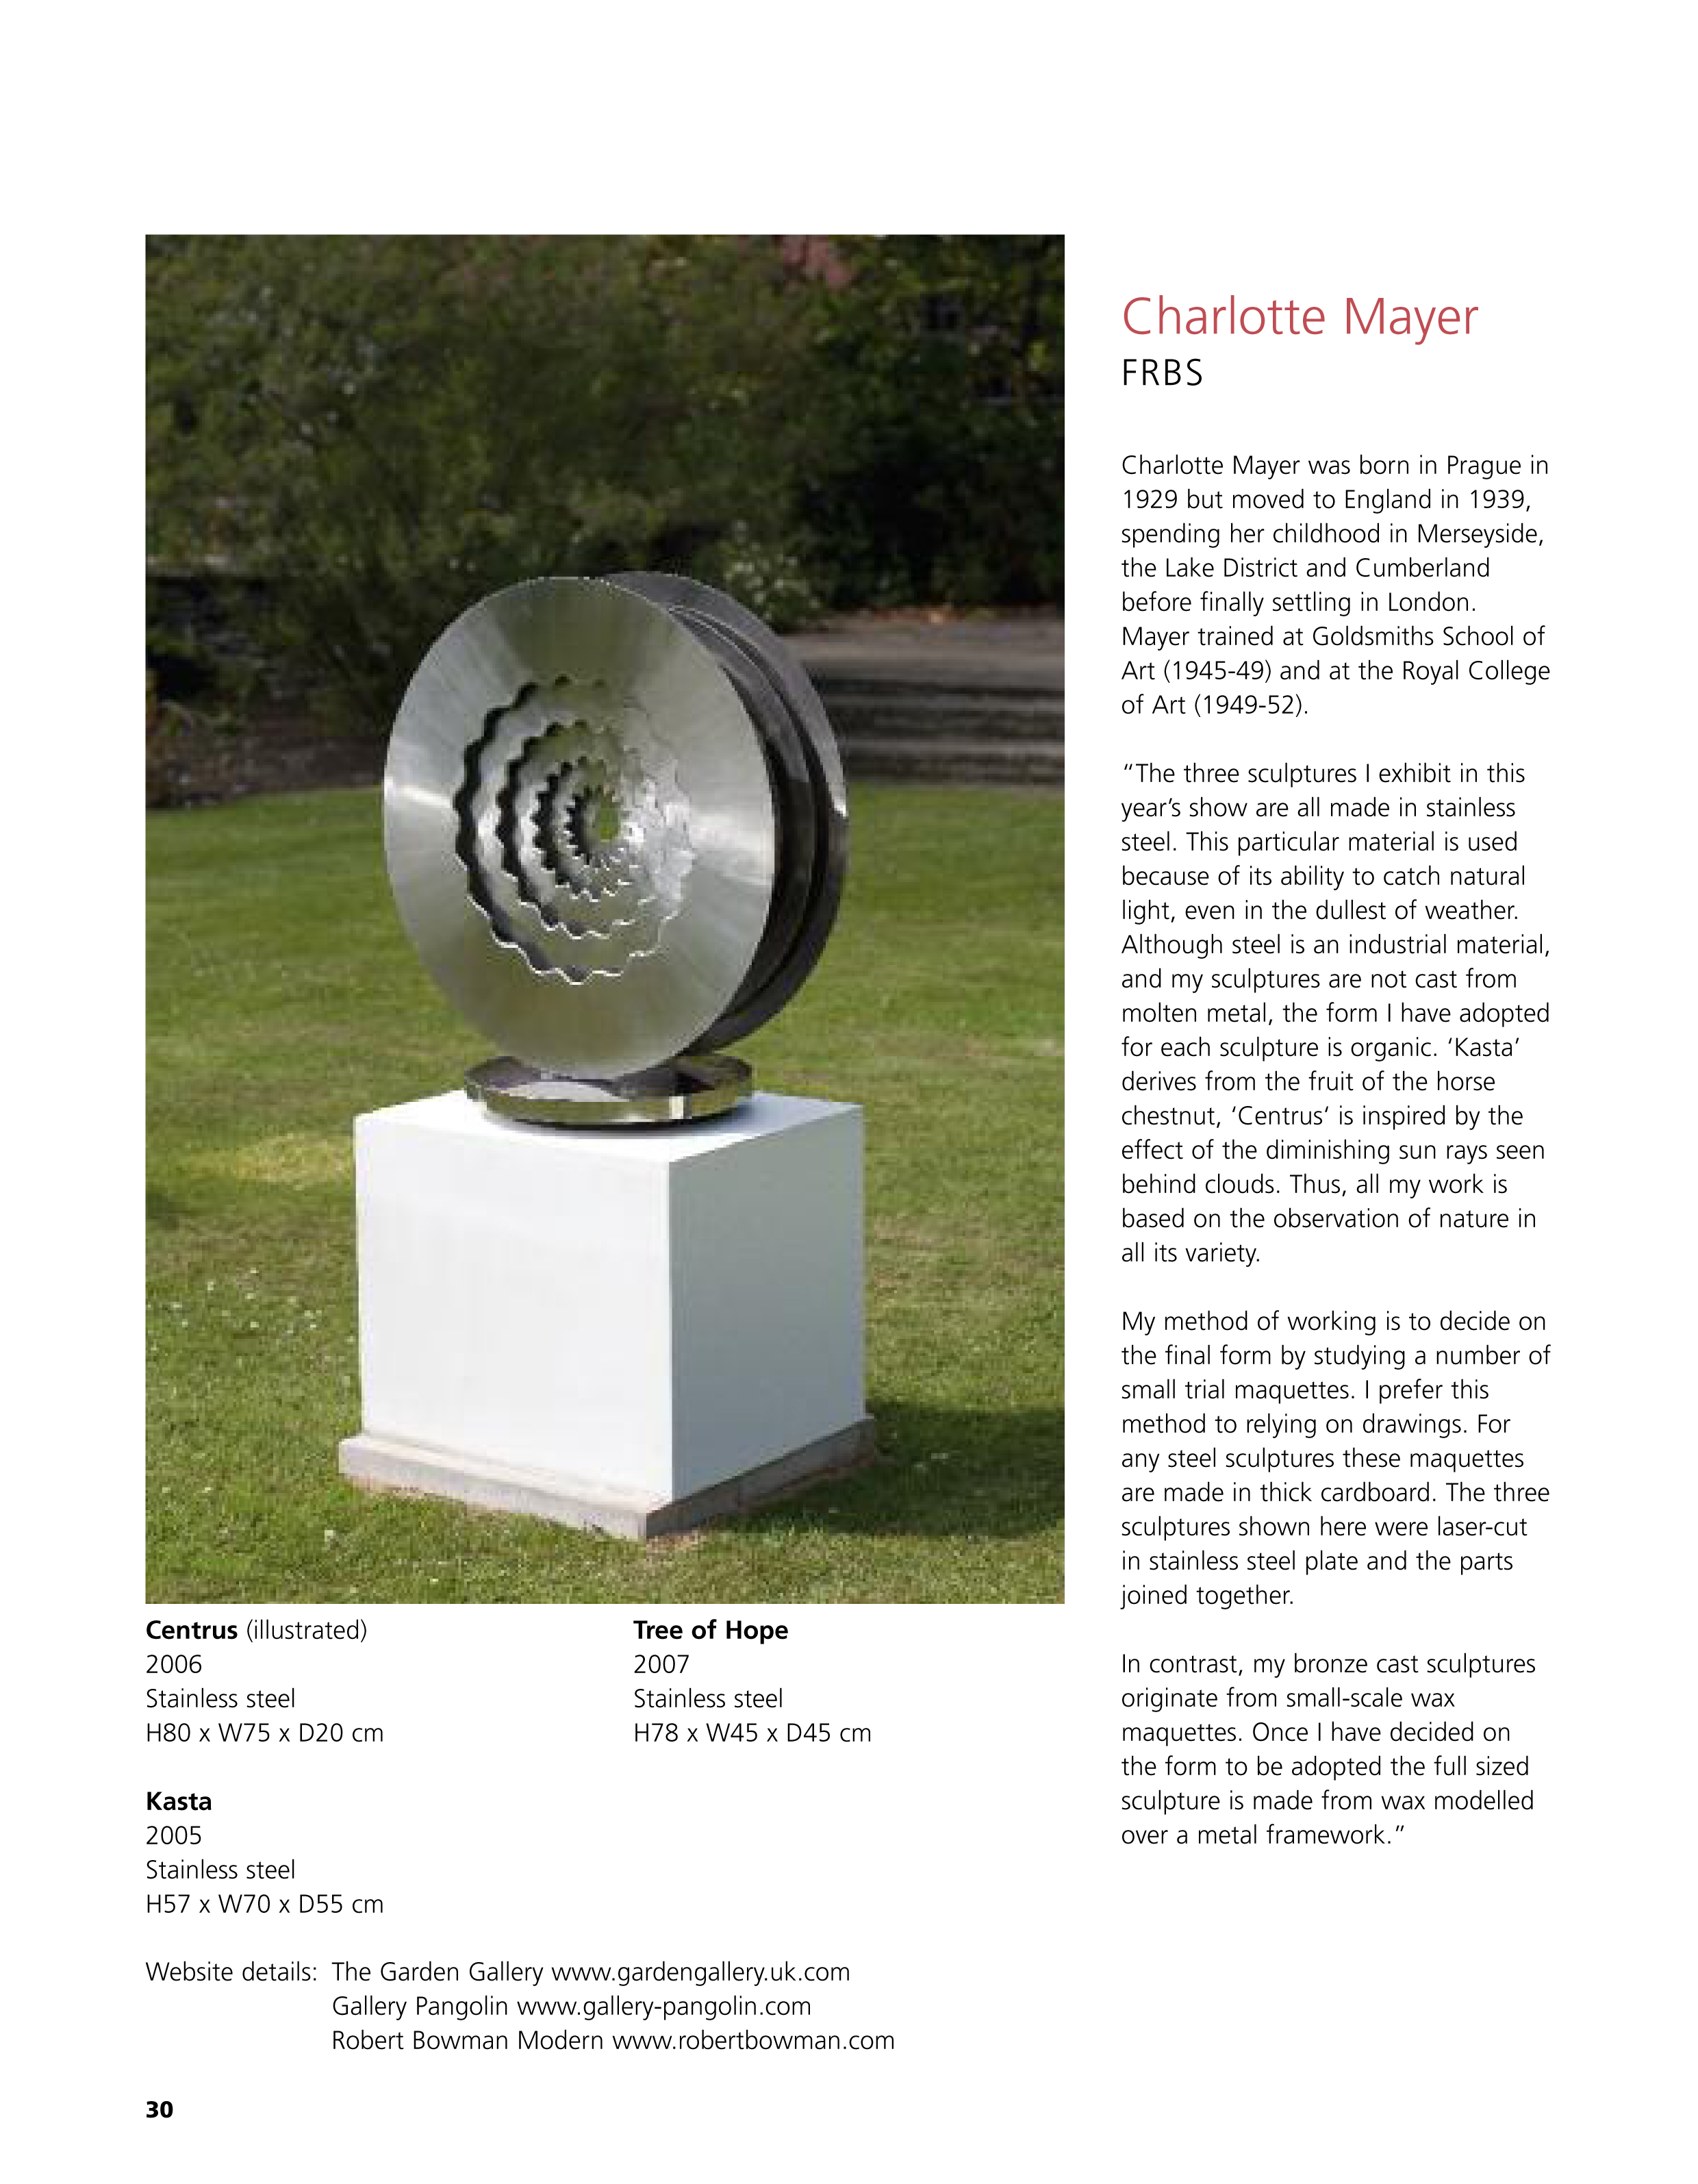 sculpturebooklet 2010 Leicester-30.jpg